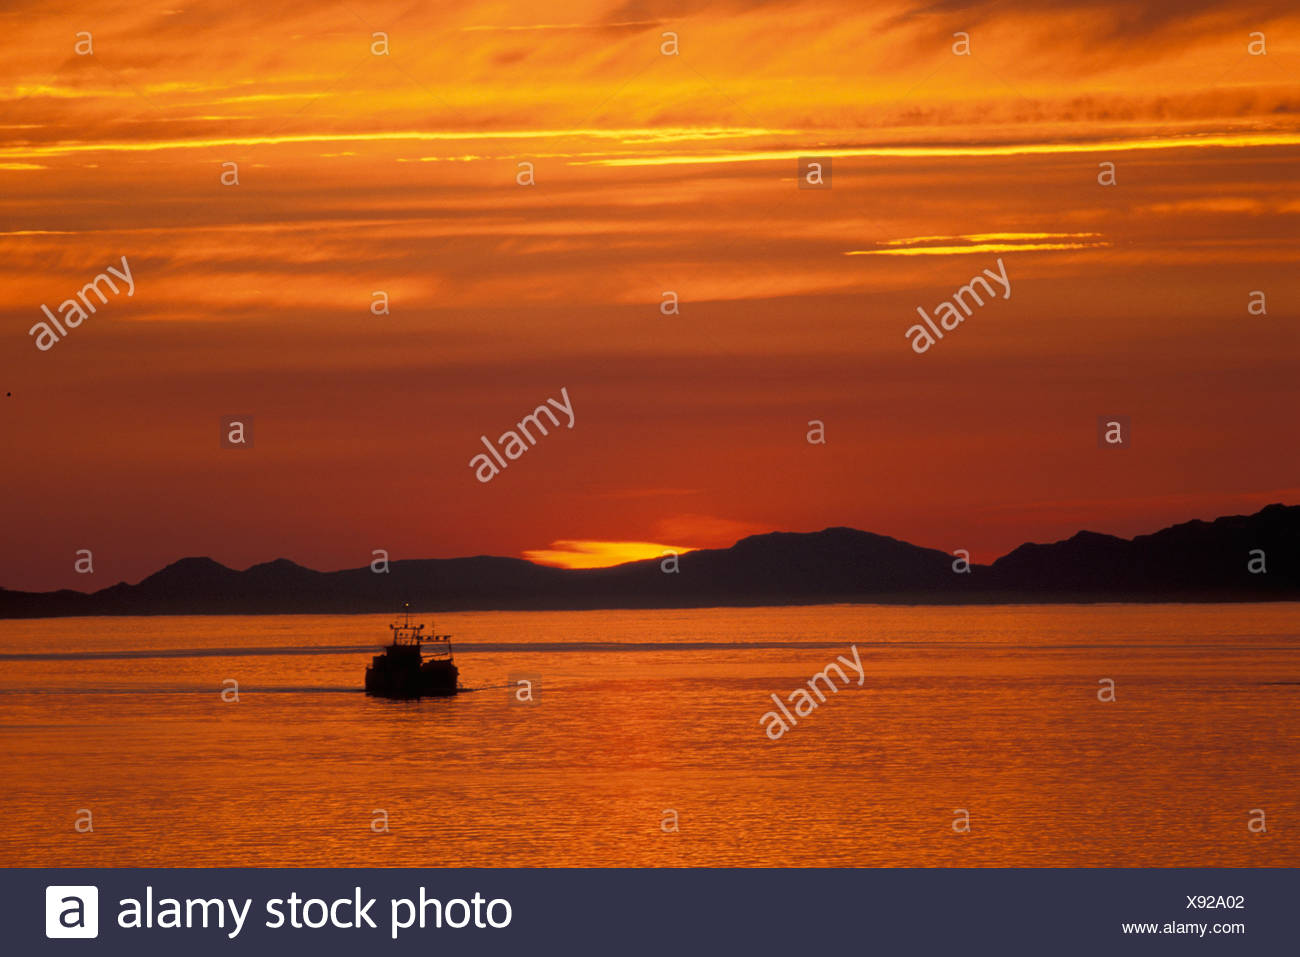 Sunset, pasaje, cerca de San Petersburgo, Alaska, EE.UU., esbozó, naranja, amanecer, crepúsculo, crepúsculo, amanecer, tarde, noche, barco, lago Imagen De Stock